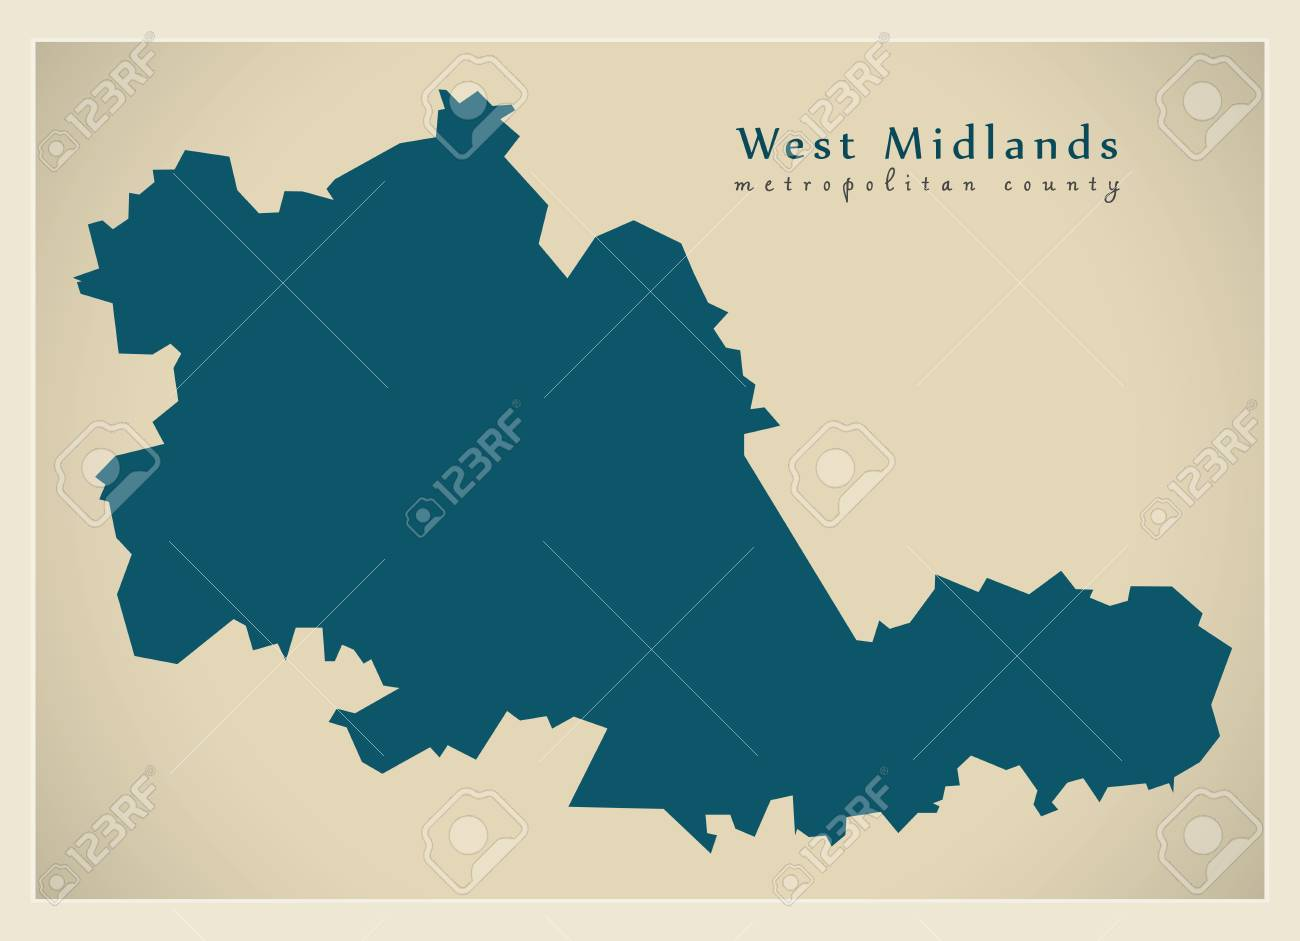 Map Of England Midlands.Modern Map West Midlands Metropolitan County England Uk Royalty